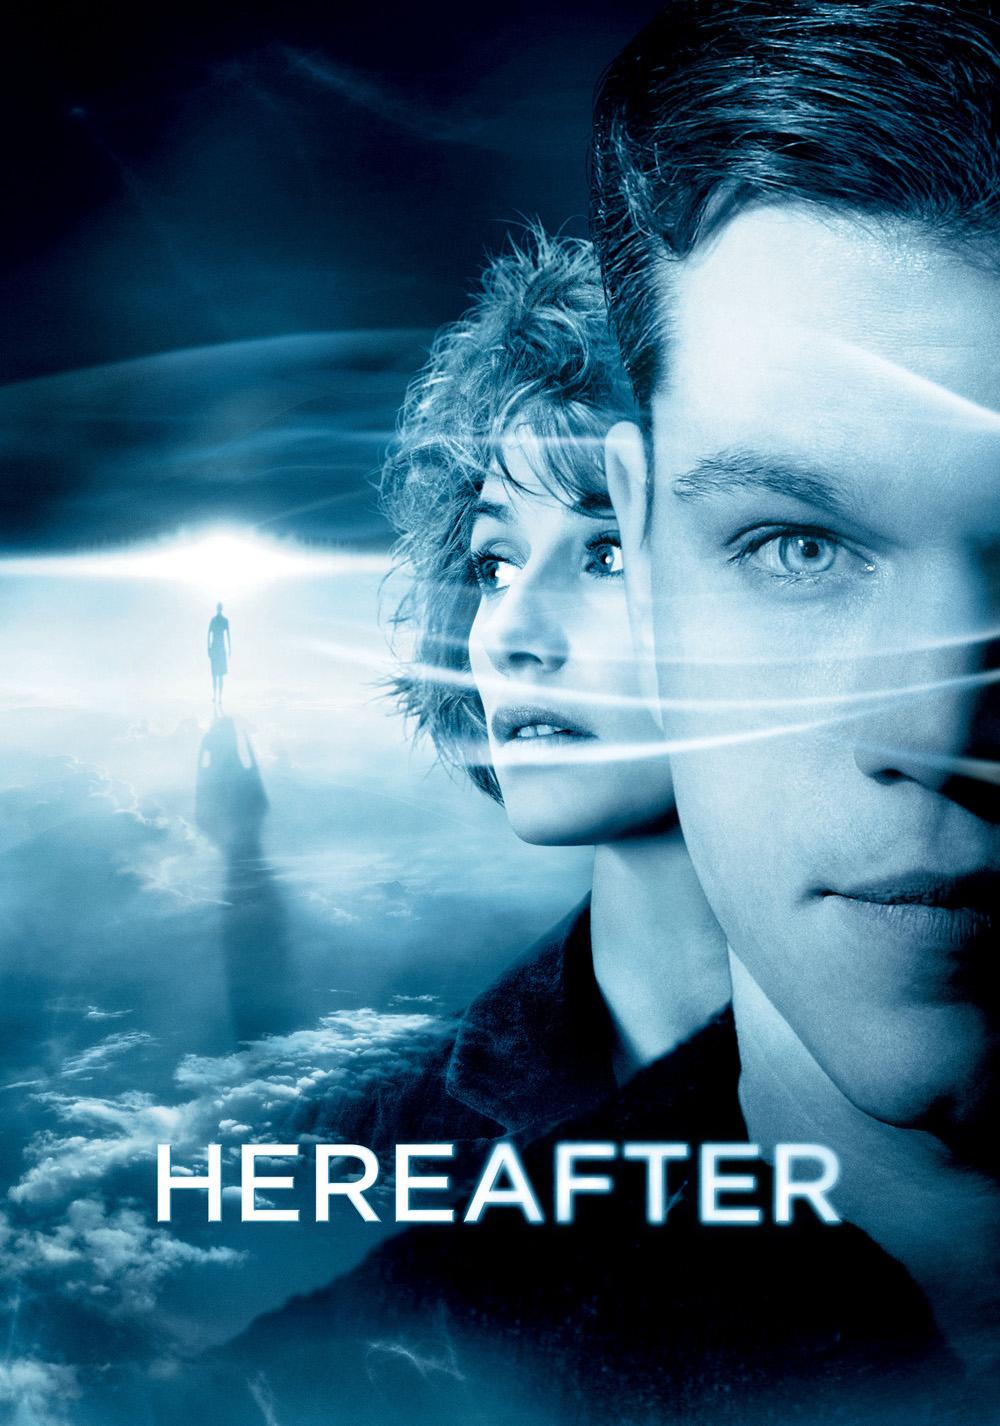 Hereafter Movie Poster Hereafter Movie Poster Image